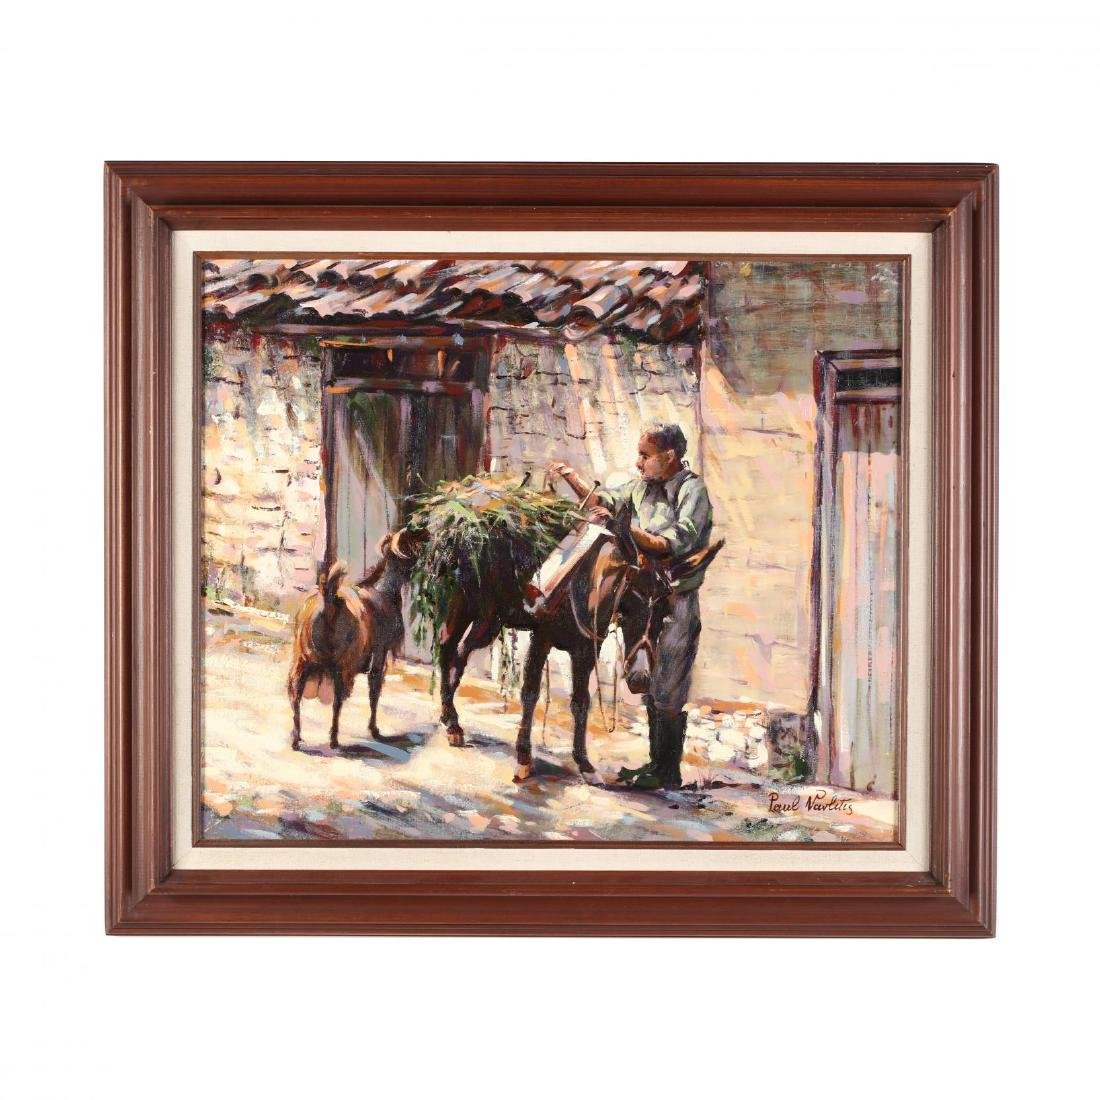 Paul Vavlitis (Cypriot-American, 1914-2004),  Coming